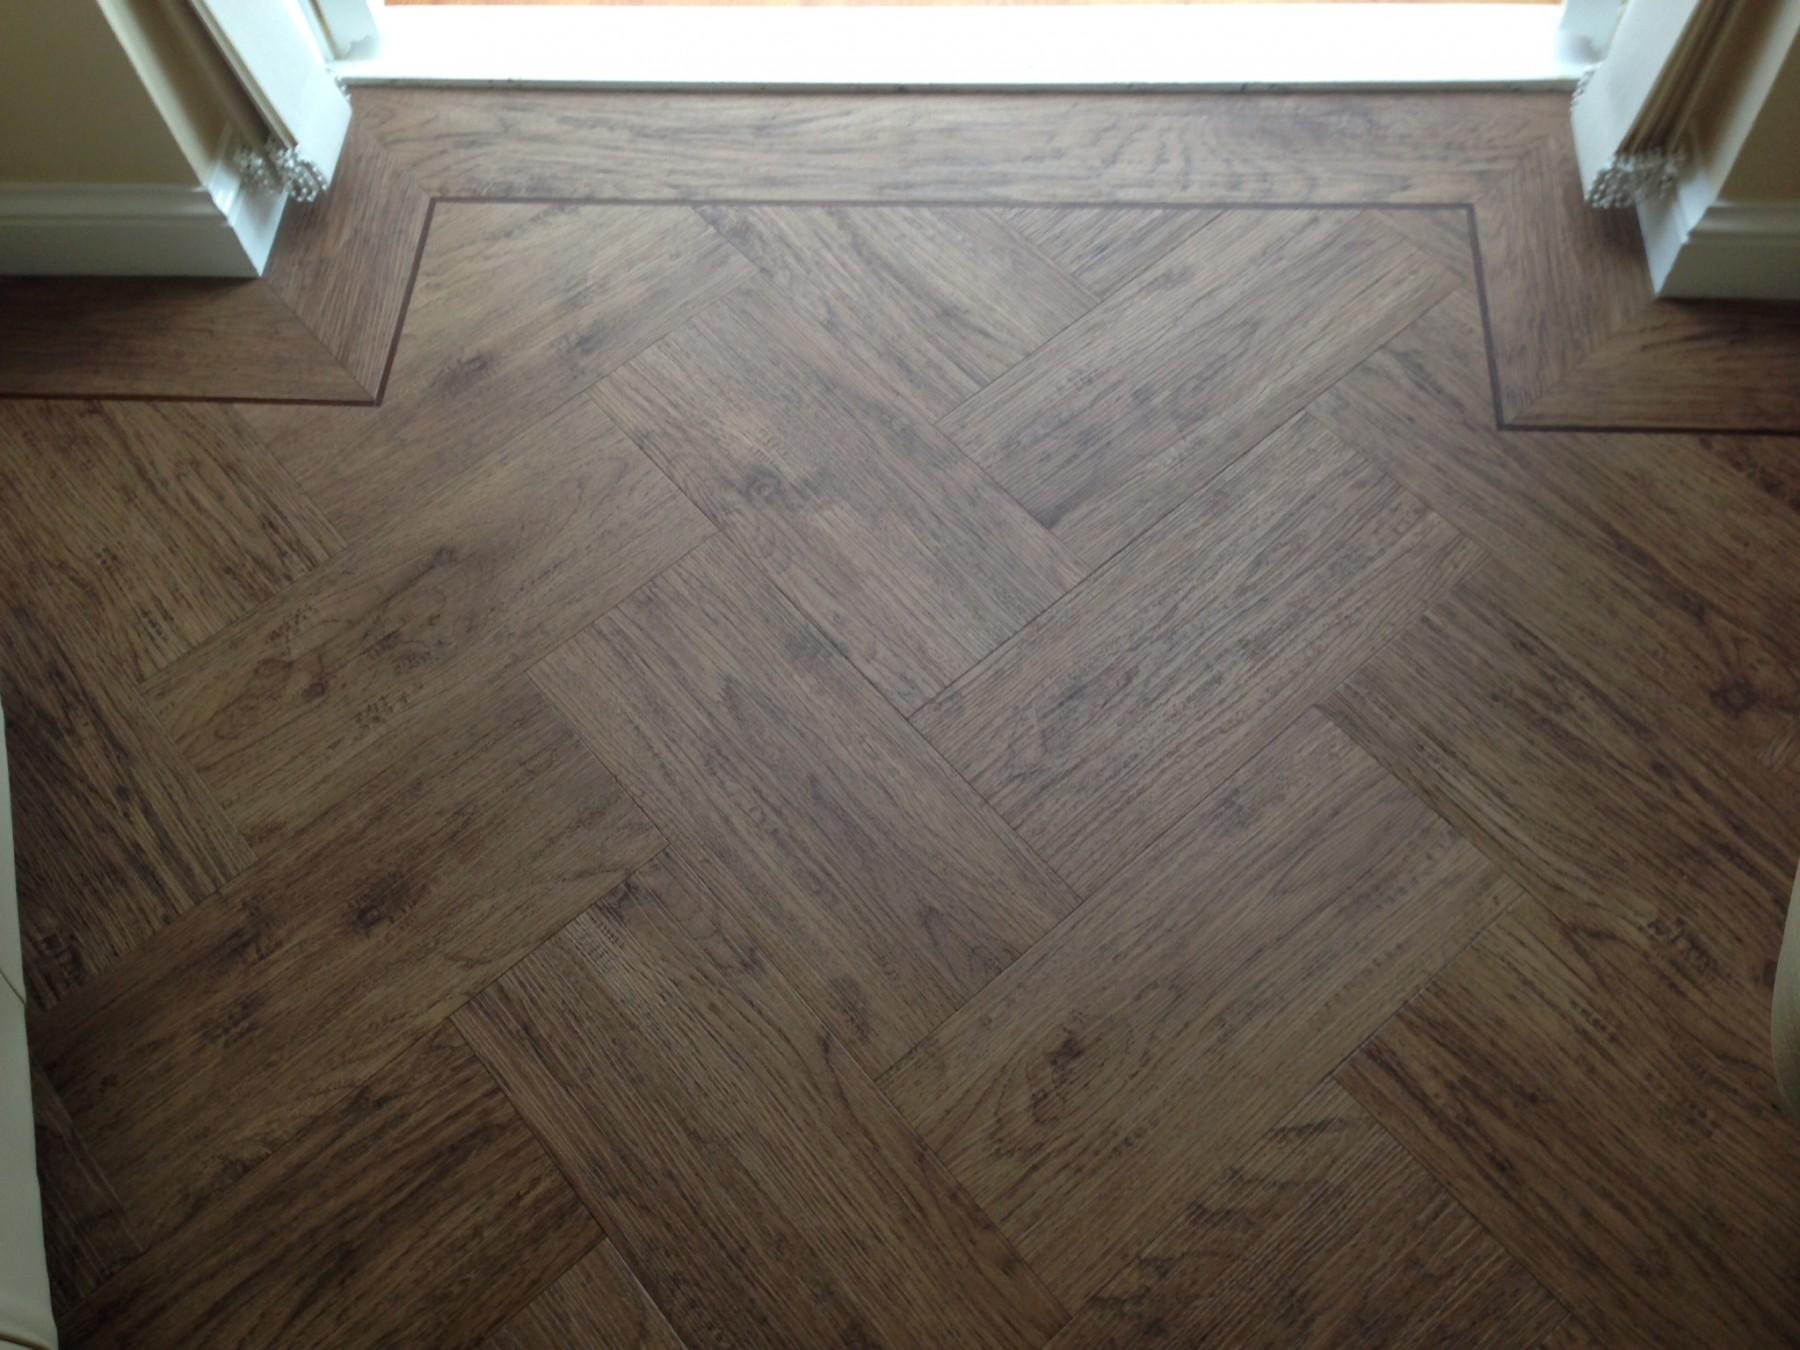 Dark chevroned wooden flooring